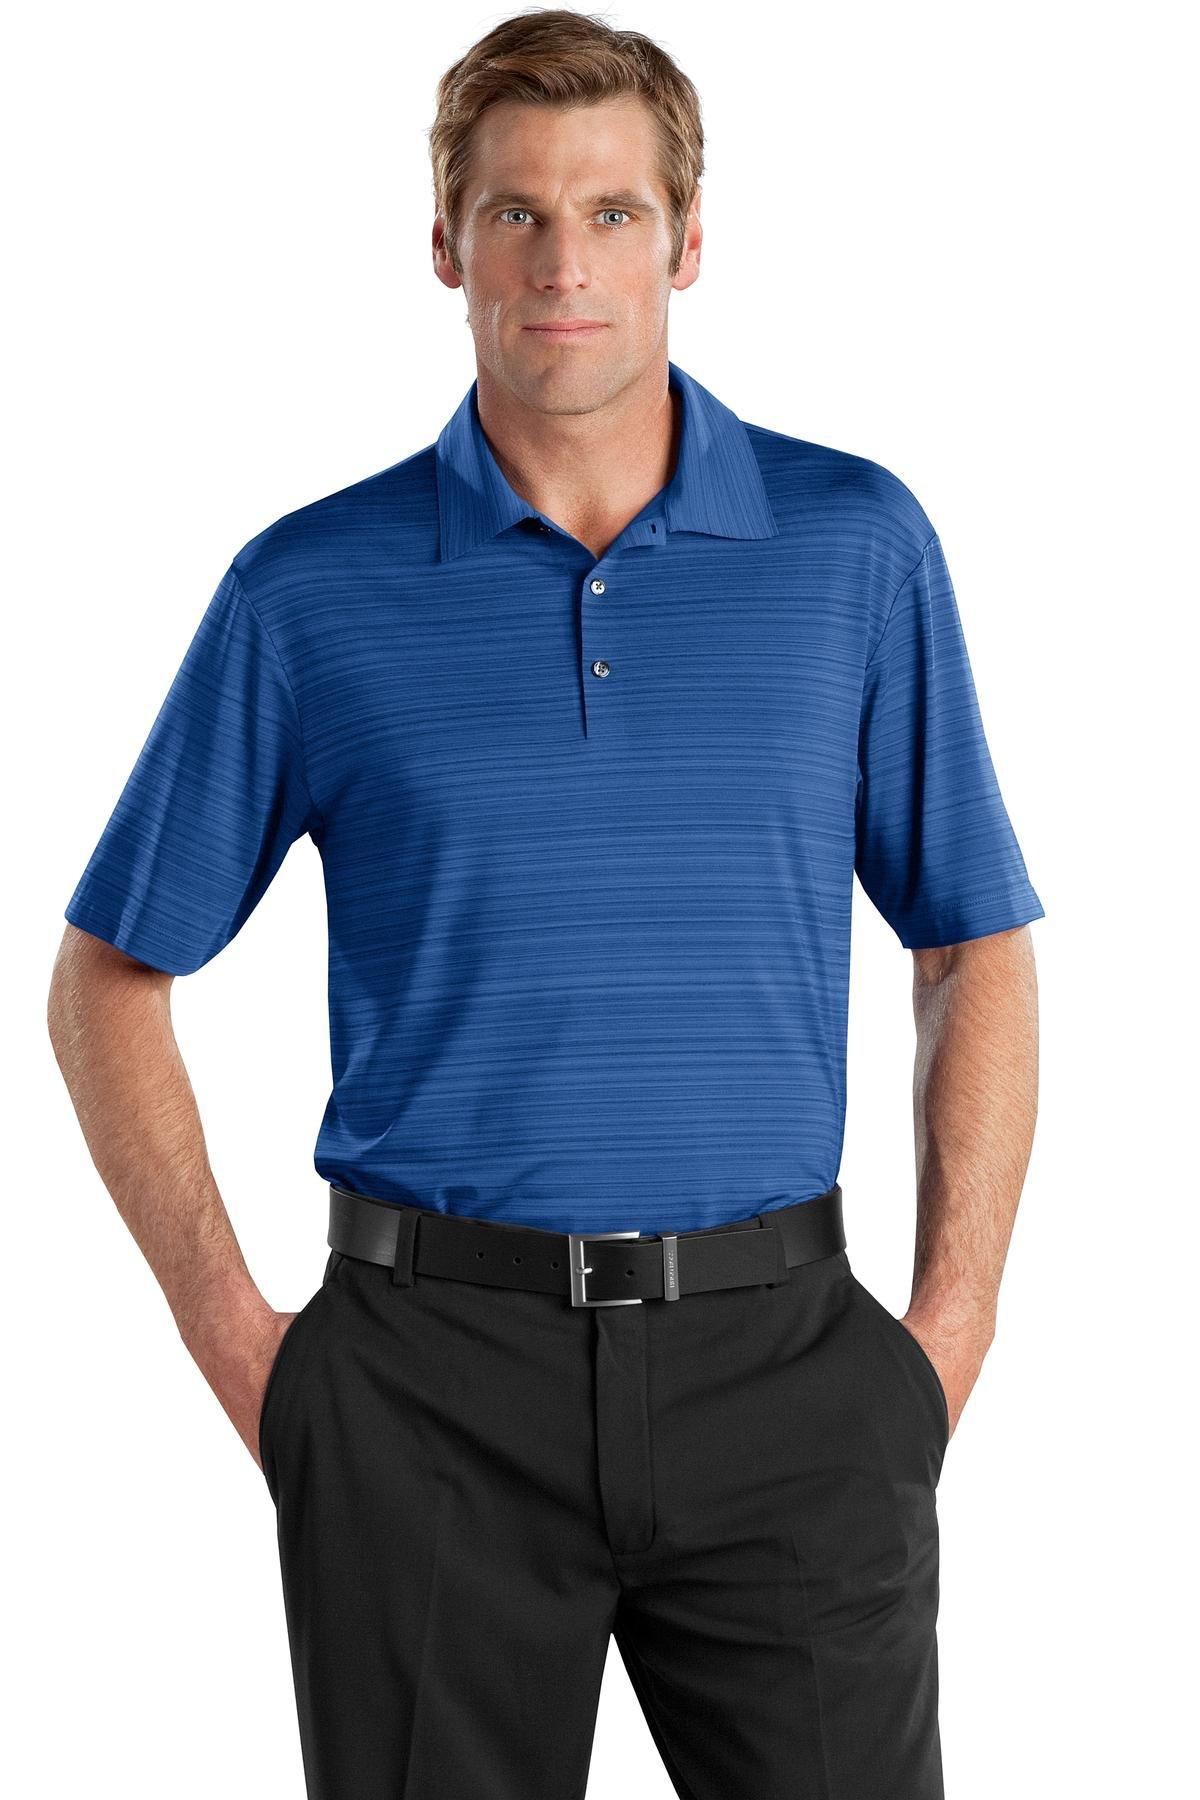 Nike Golf - Elite Series Dri-FIT Heather Fine Line Bonded Polo, Deep Royal, XXXX-Large